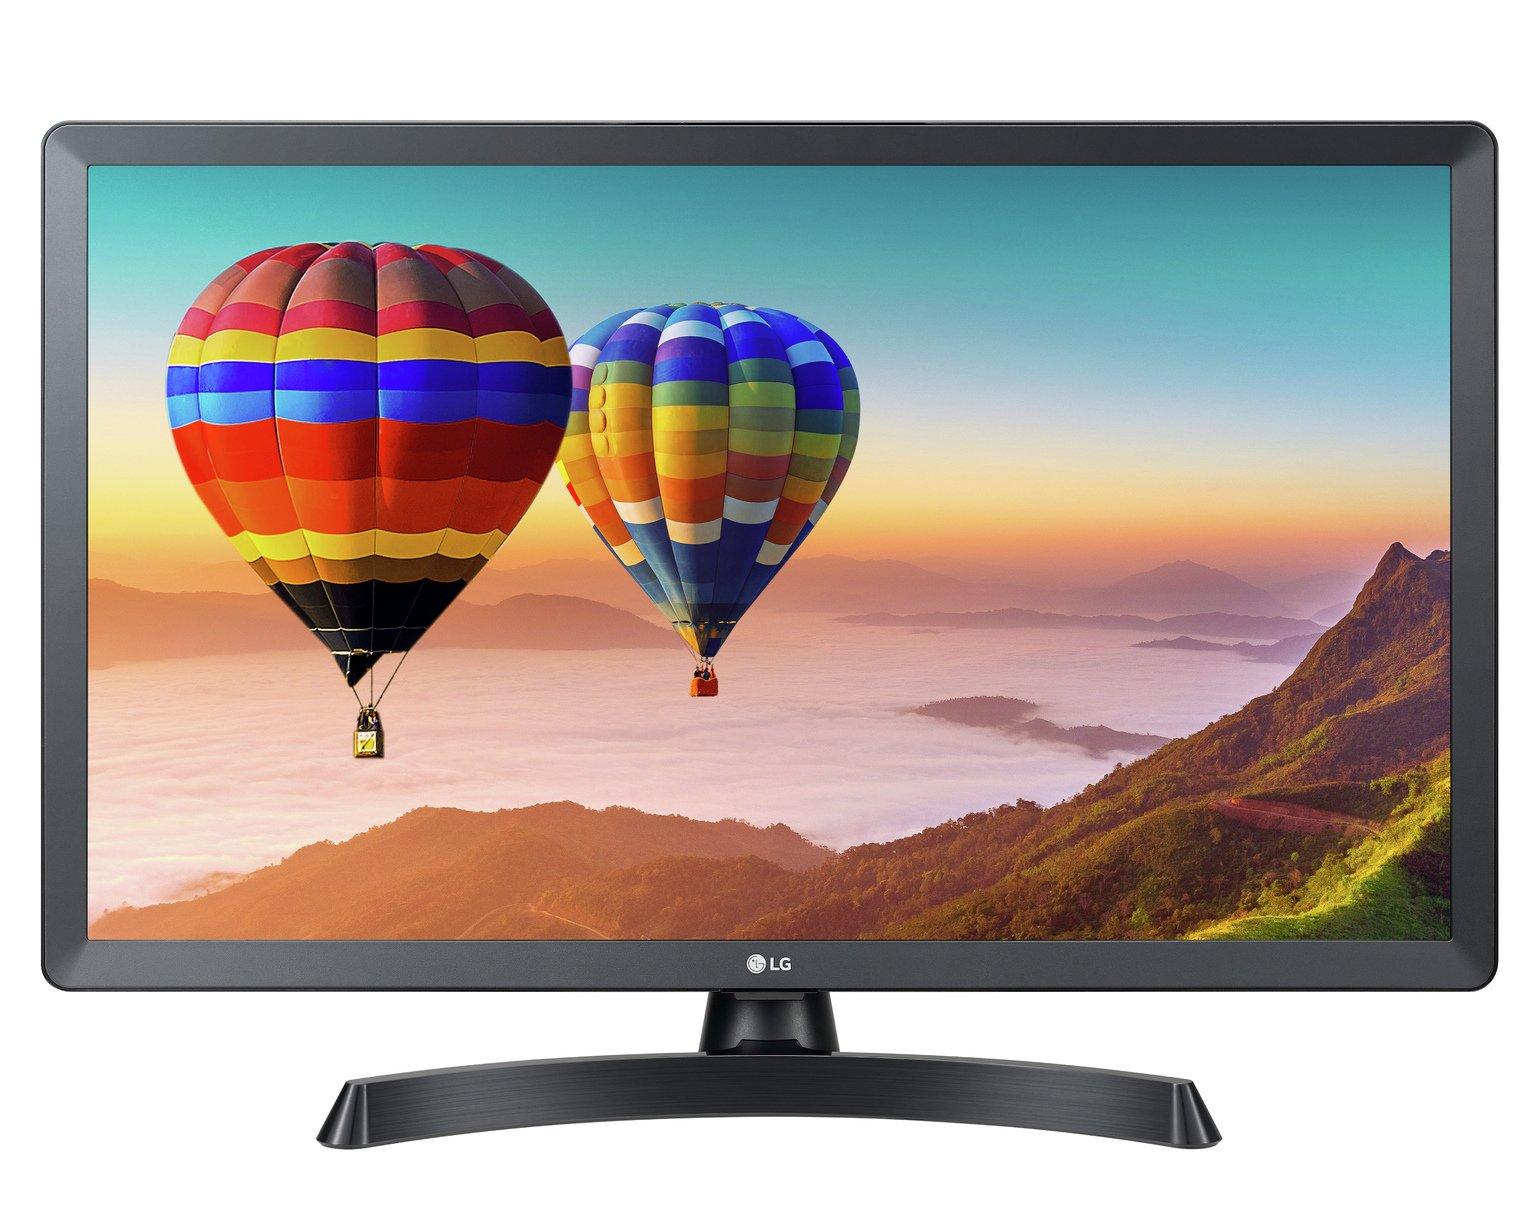 LG 28 Inch 28TN515V HD Ready LED TV Monitor